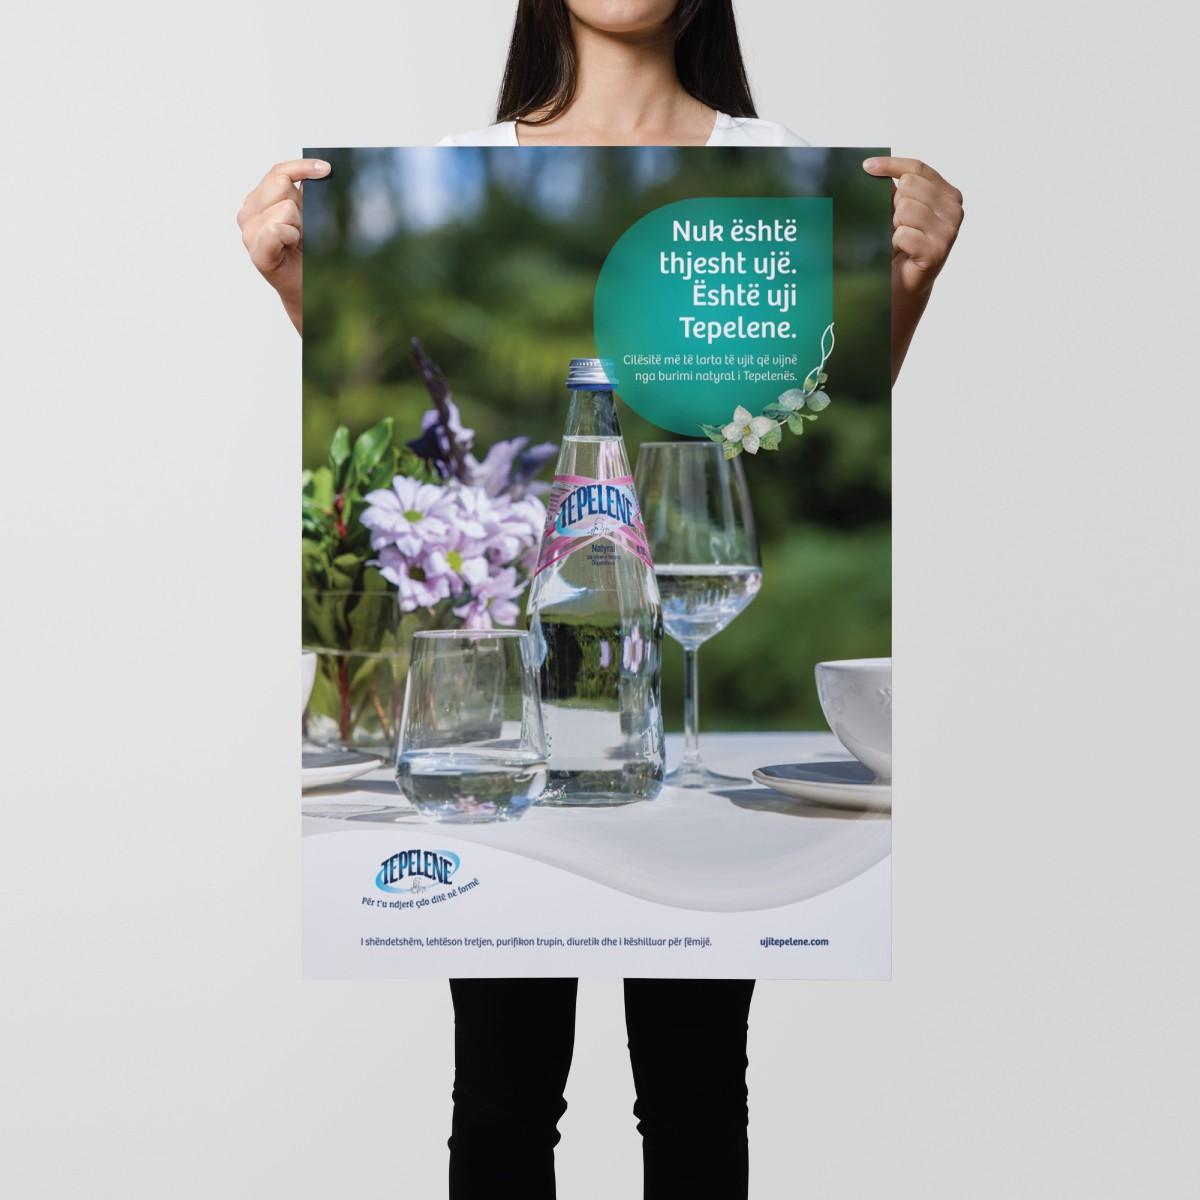 uje tepelene campaign poster